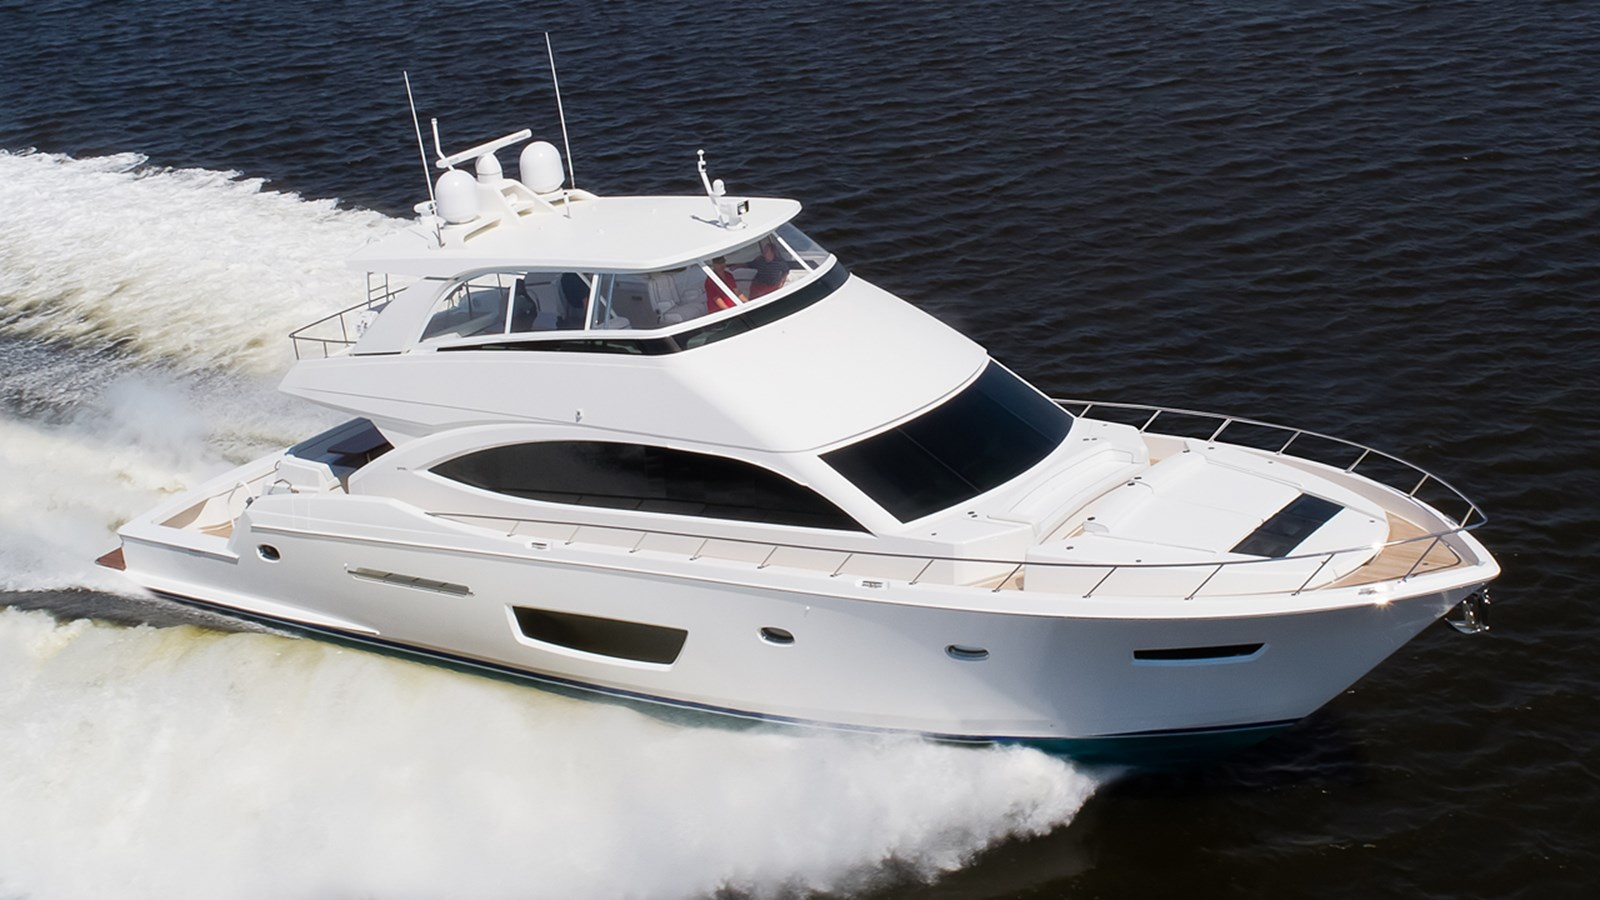 2019 VIKING 82 Cockpit Motor Yacht (VK82-303) For Sale